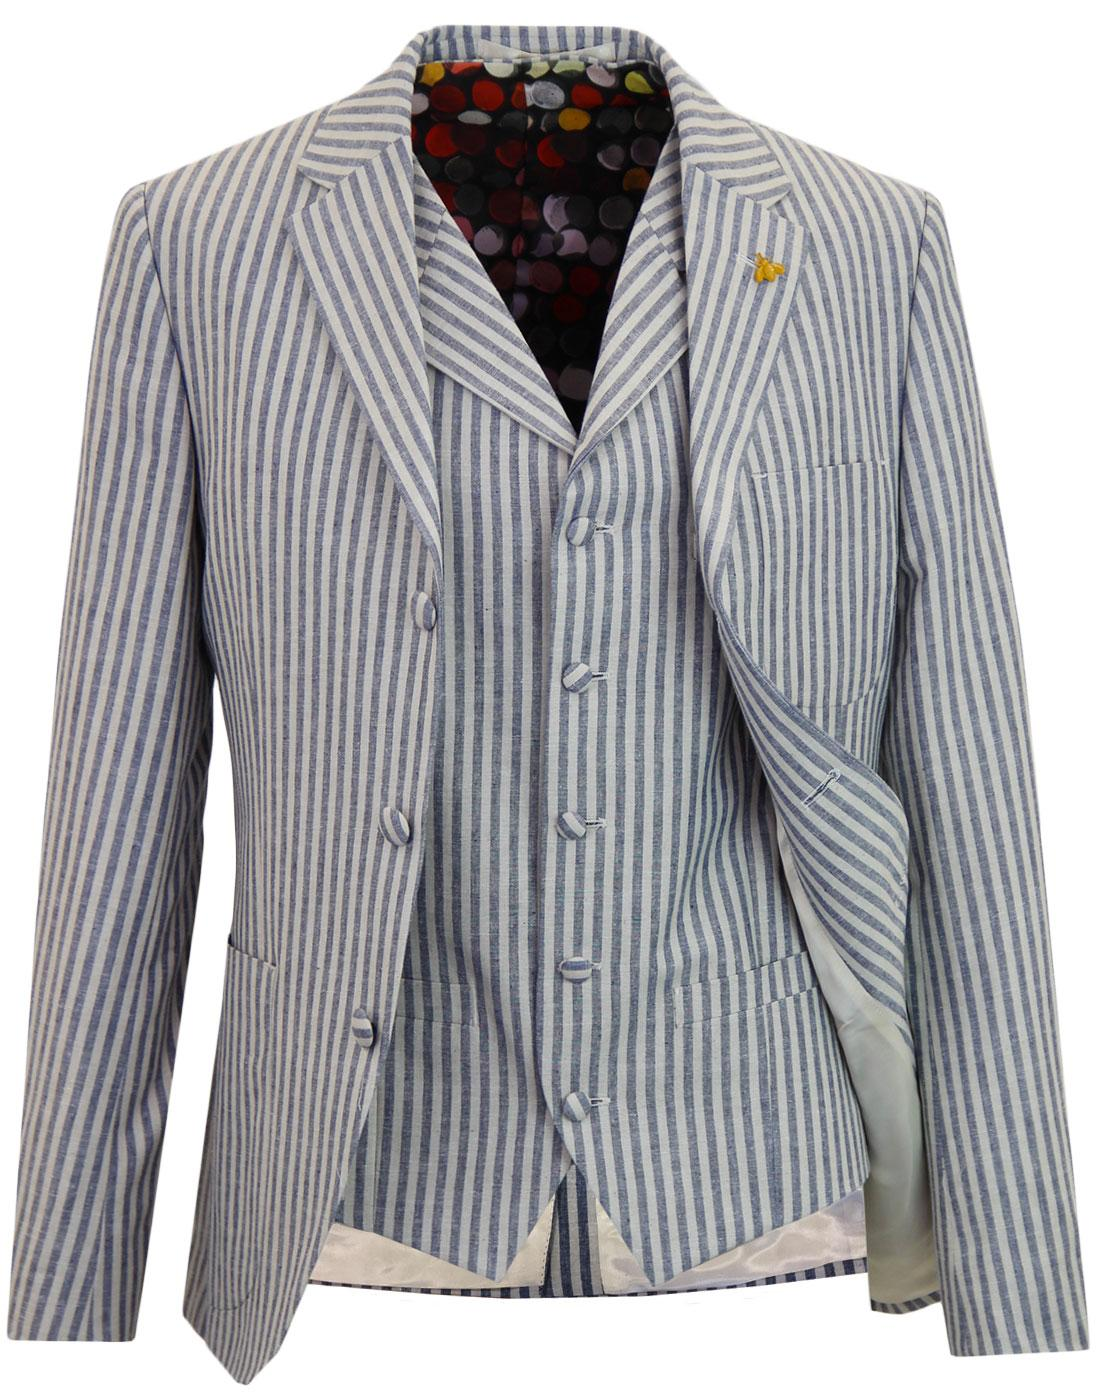 GIBSON LONDON 60s Mod Boating Blazer & Waistcoat